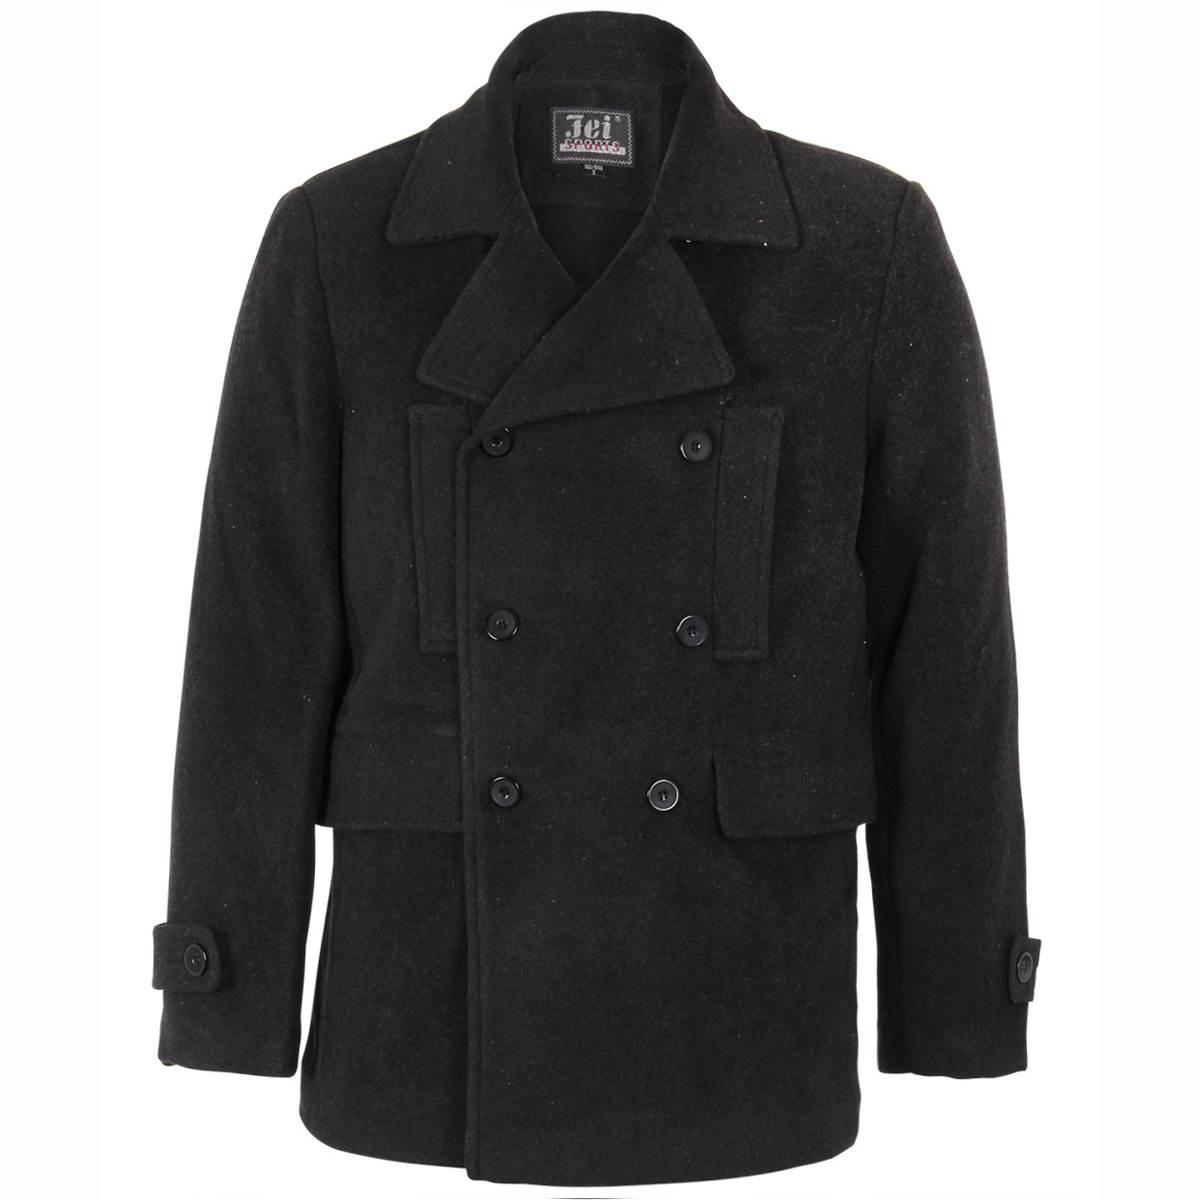 herren schwarze winterjacke pea coat caban jacke. Black Bedroom Furniture Sets. Home Design Ideas